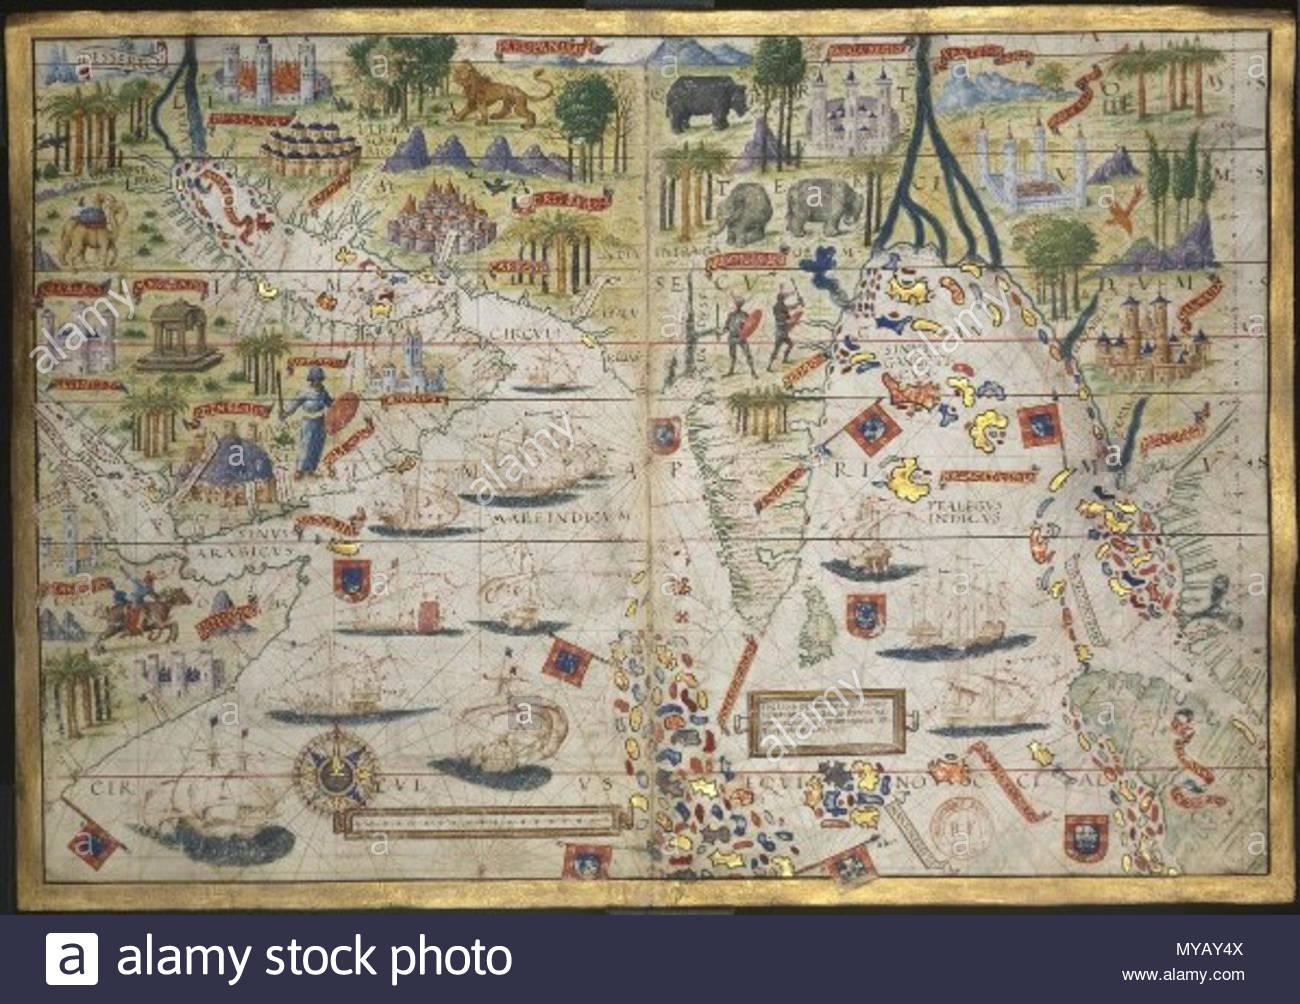 . English: Map of the Atlas Miller showing the Indian Ocean. Español: Mapa del Atlas Miller que muestra el océano Índico. circa 1519. Unsigned. Attributed to Lopo Homem, Jorge Reinel, Pedro Reinel and Antonio de Holanda. 54 AtlasMiller BNF OceanoIndico - Stock Image